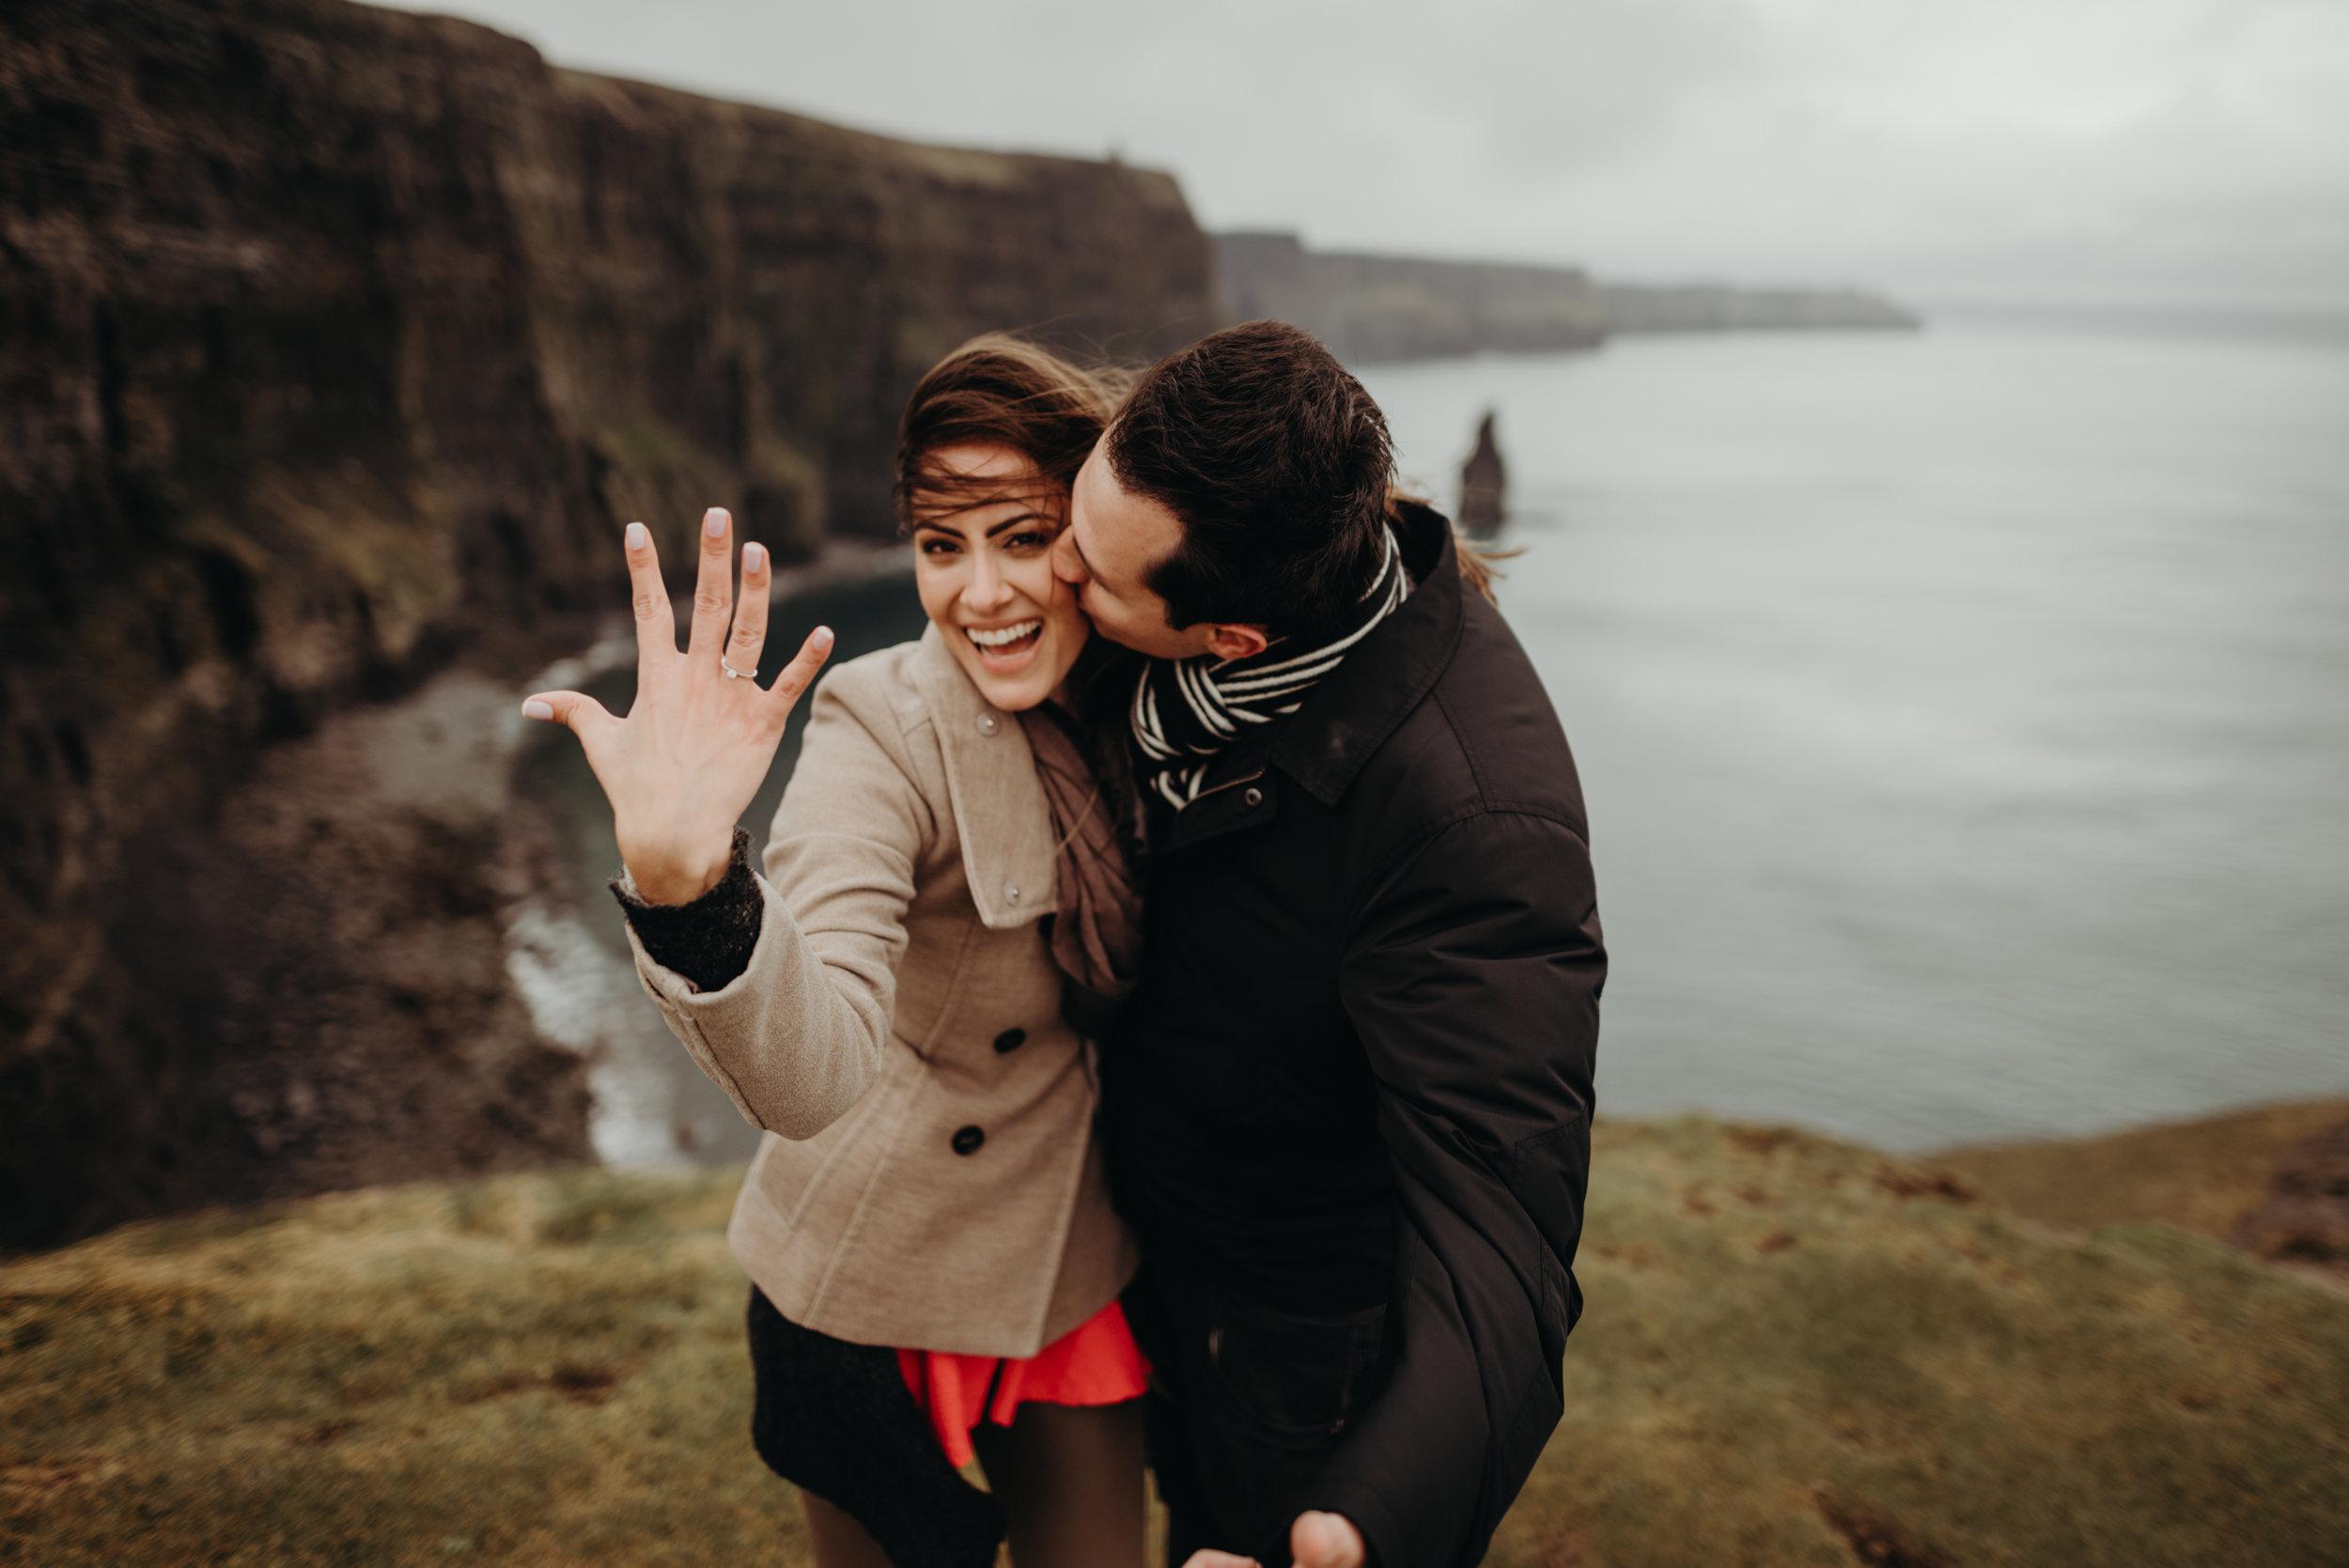 Cliffs Of Moher Engagement Session - Cliffs of Moher Proposal - Cliffs of Mhoer Elopement_5646-Edit-5.jpg